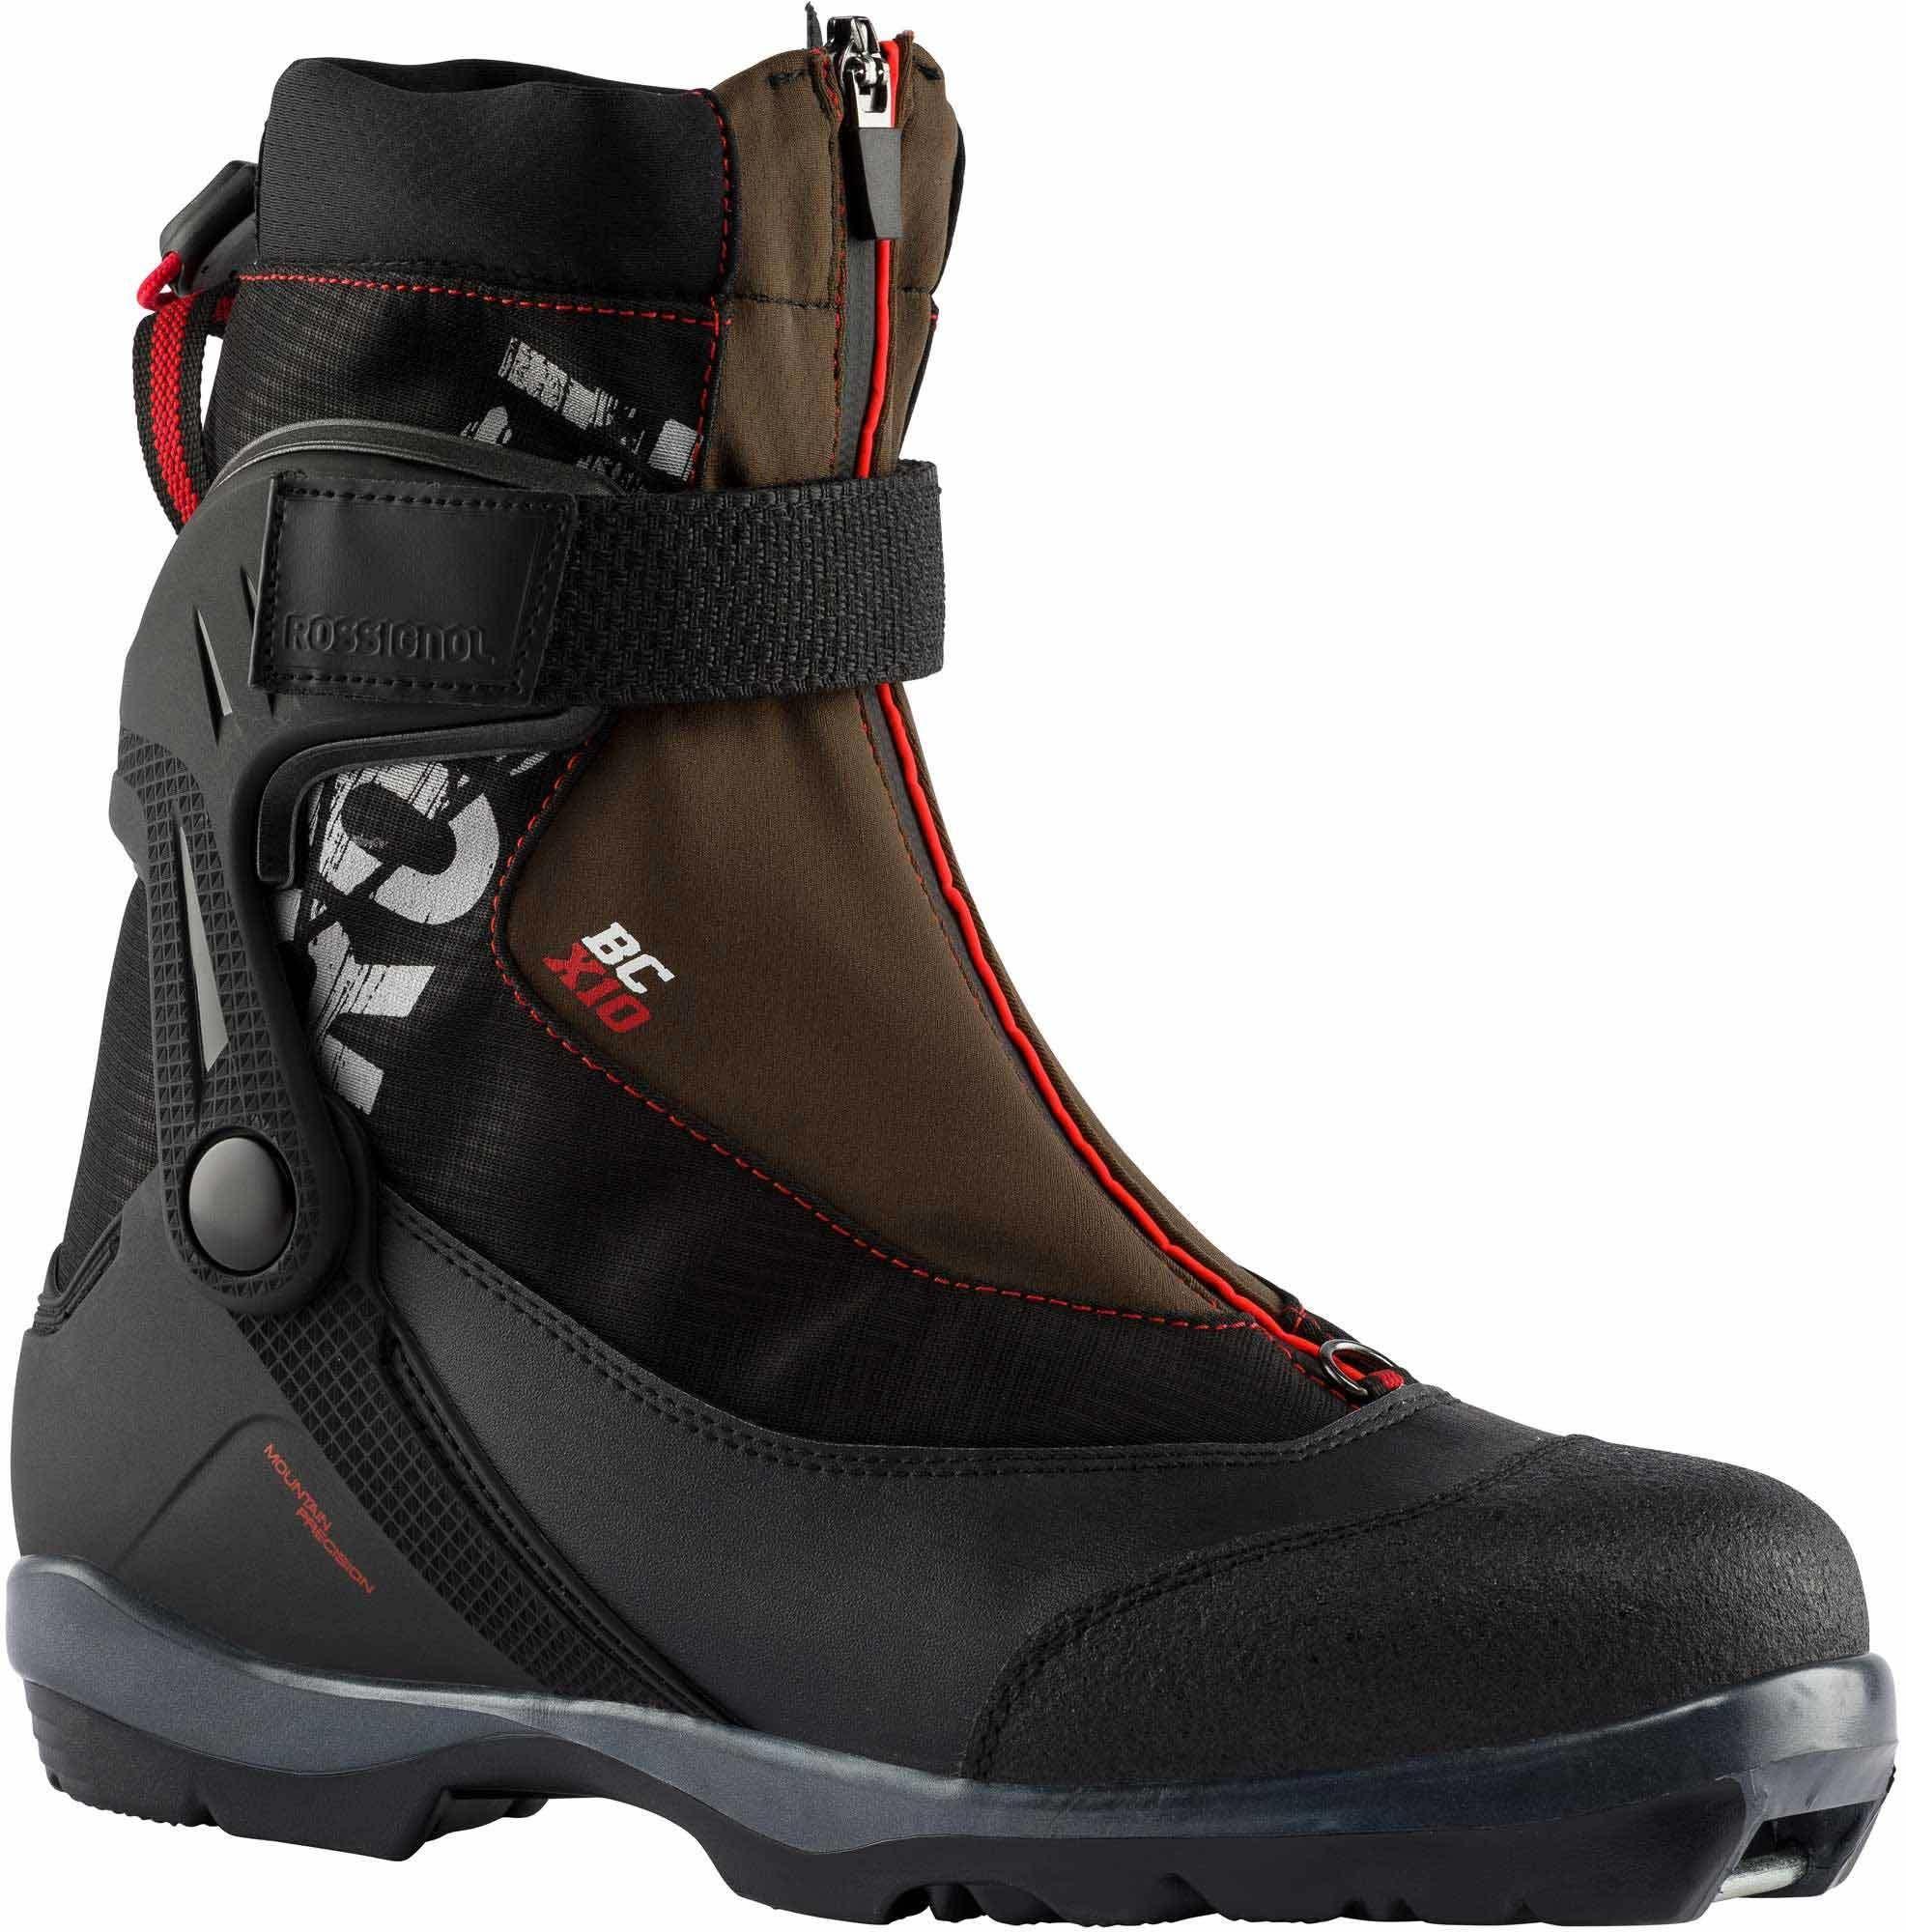 Rossignol X-6 SC XC Ski Boots Mens